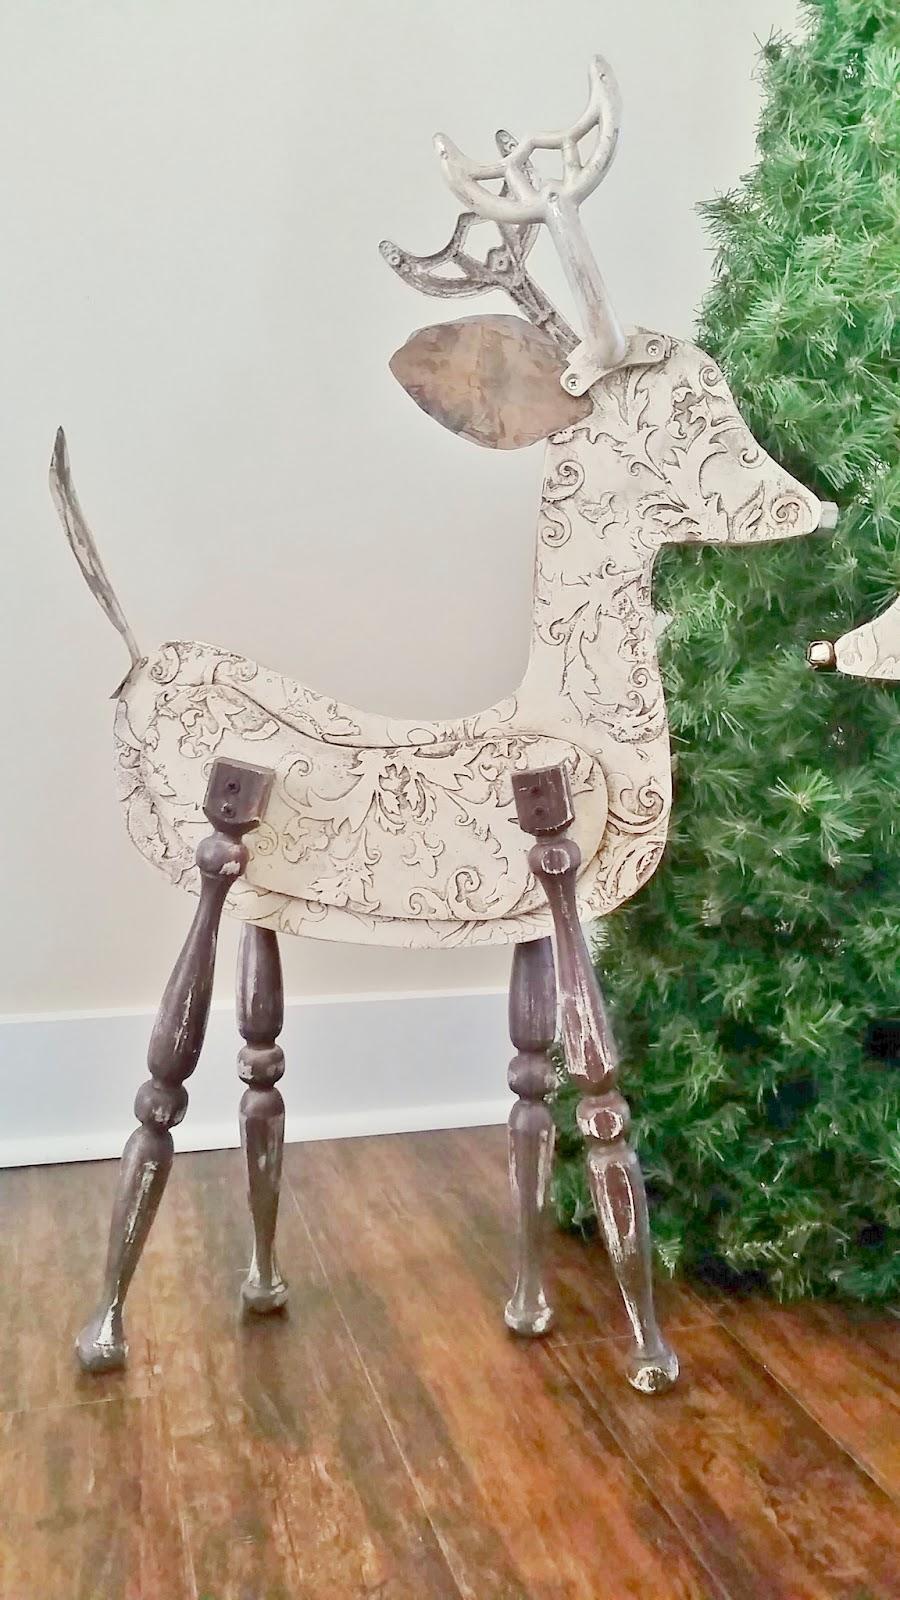 reindeer art - Large Reindeer Christmas Decorations